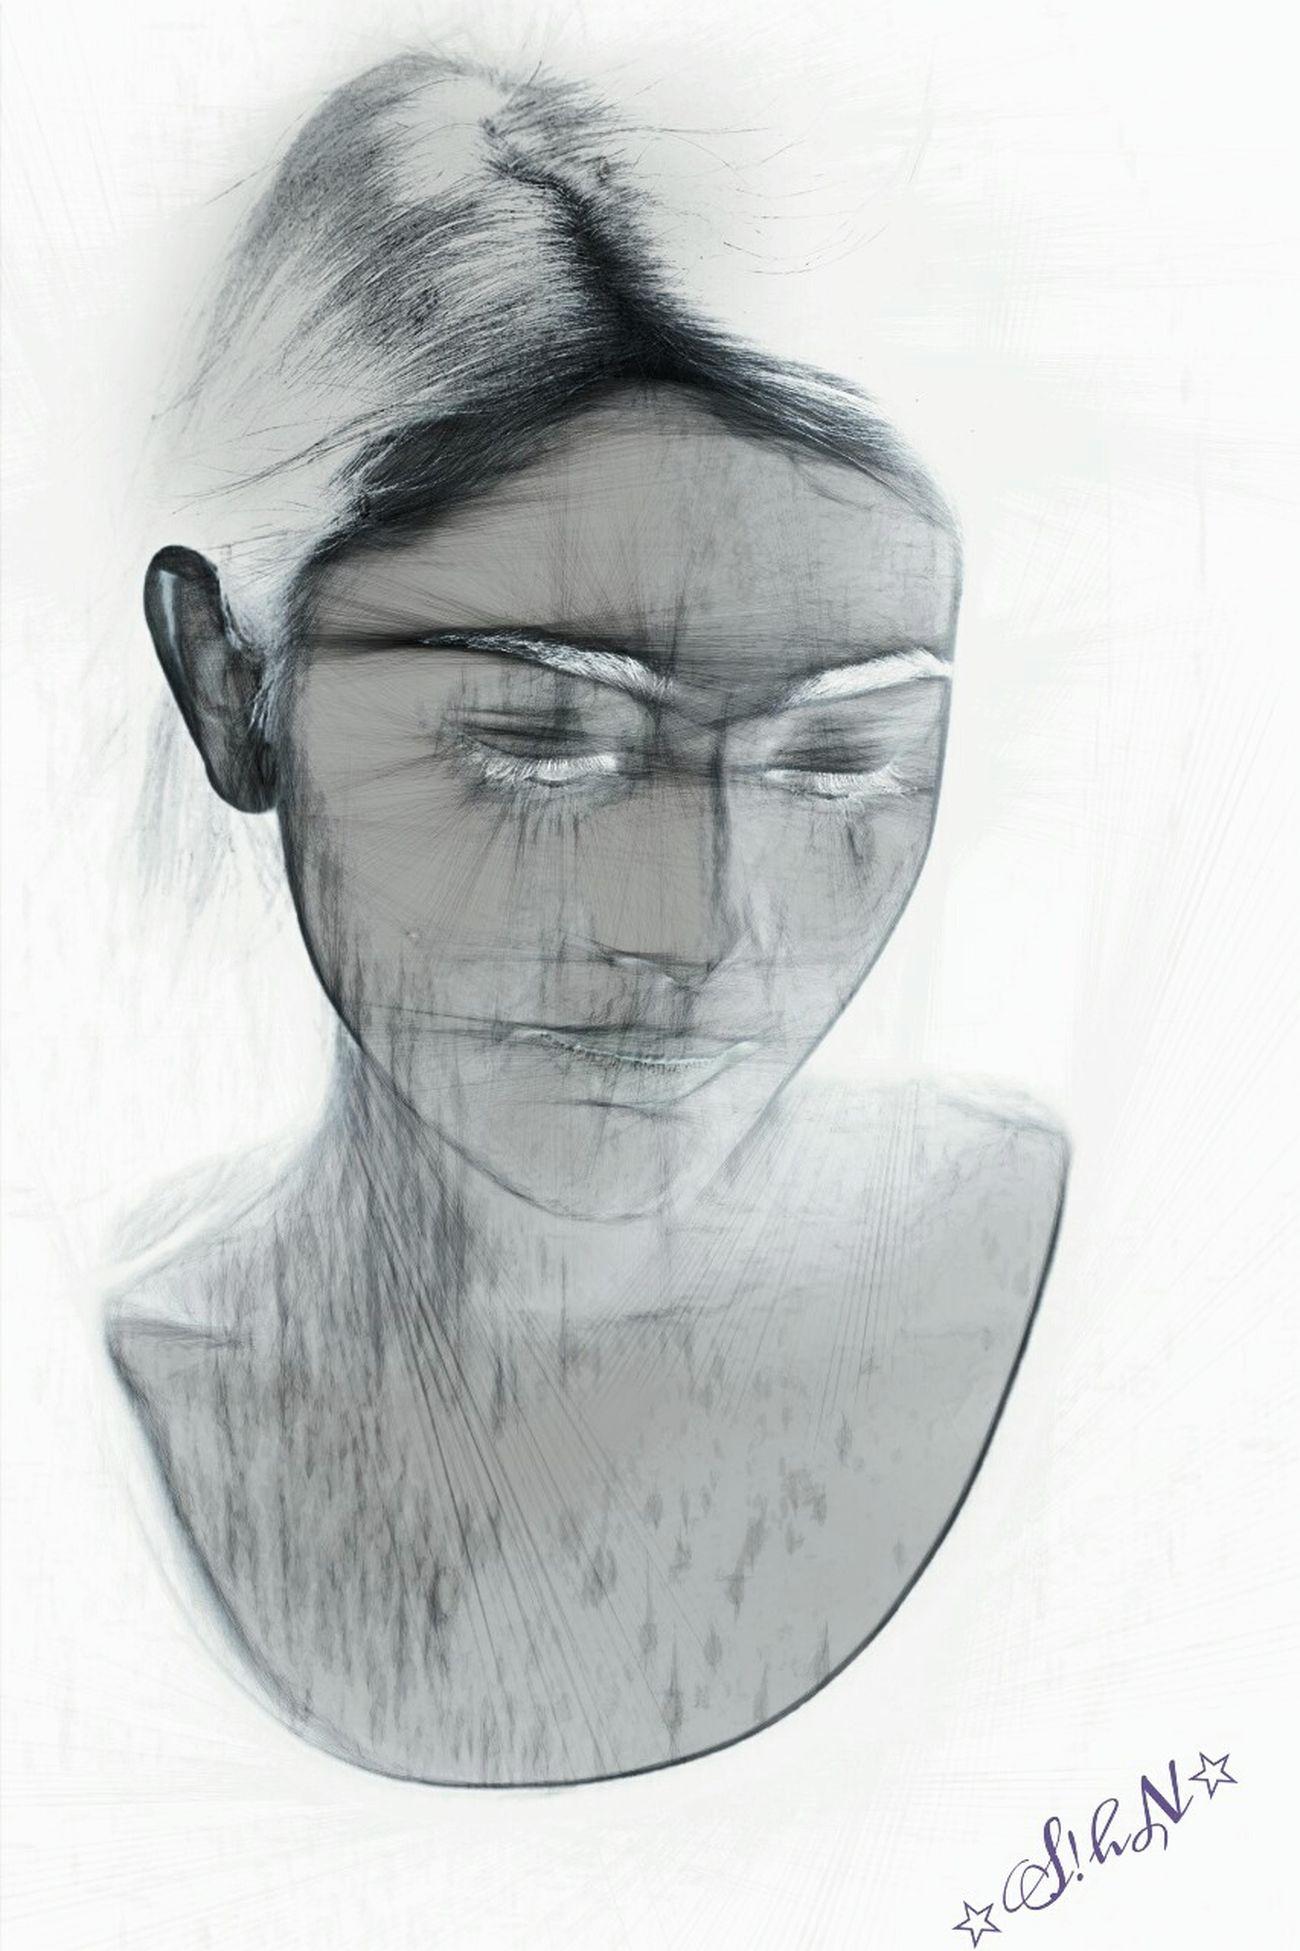 Freetoedit Artisticselfie Selfie Portrait Art, Drawing, Creativity Blackandwhitephoto Drawstepbystep Drawings Pencil Drawing